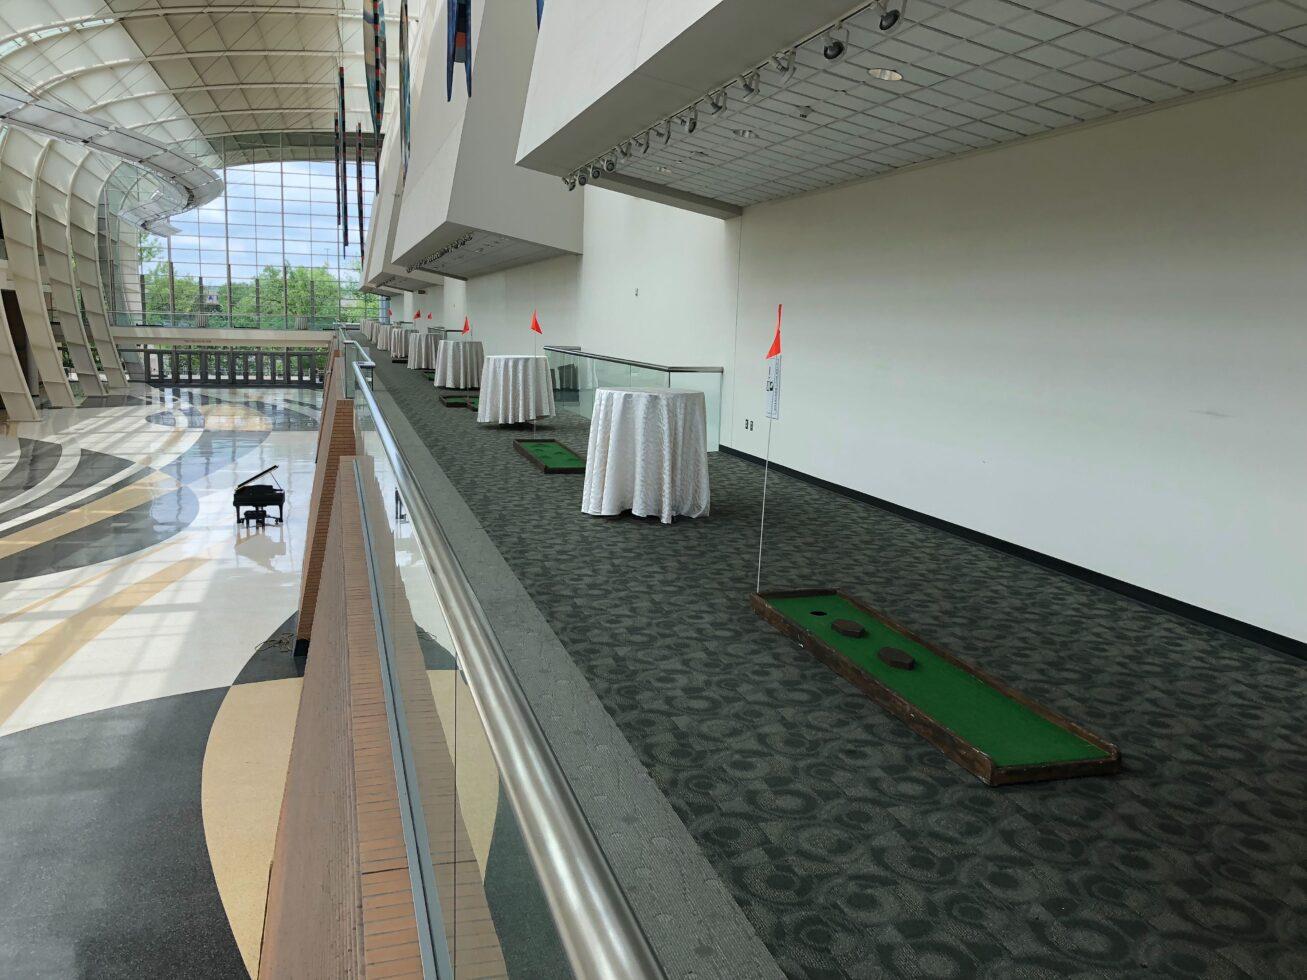 Wood Mini Golf course rental